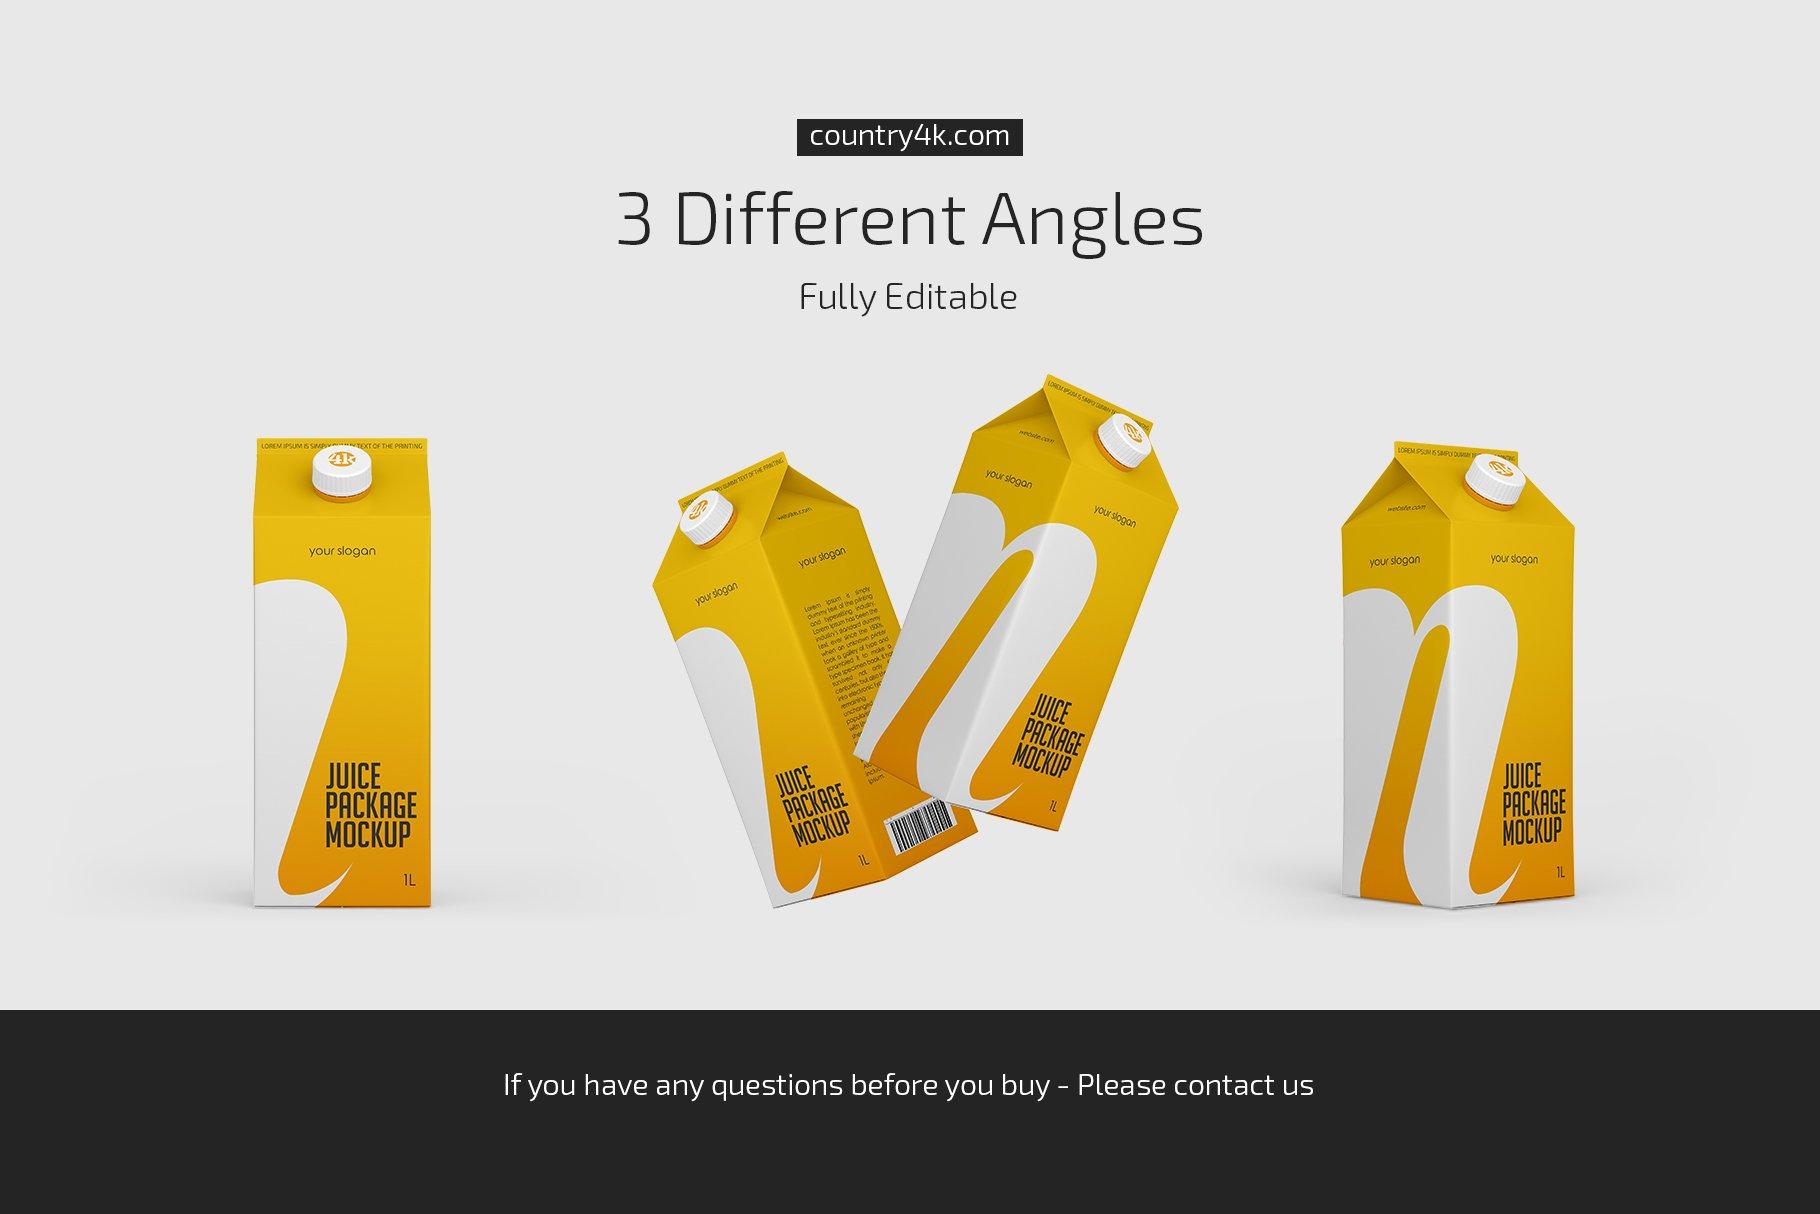 1L果汁饮料纸盒包装样机套装 1L Juice Carton Package Mockup Set插图(3)